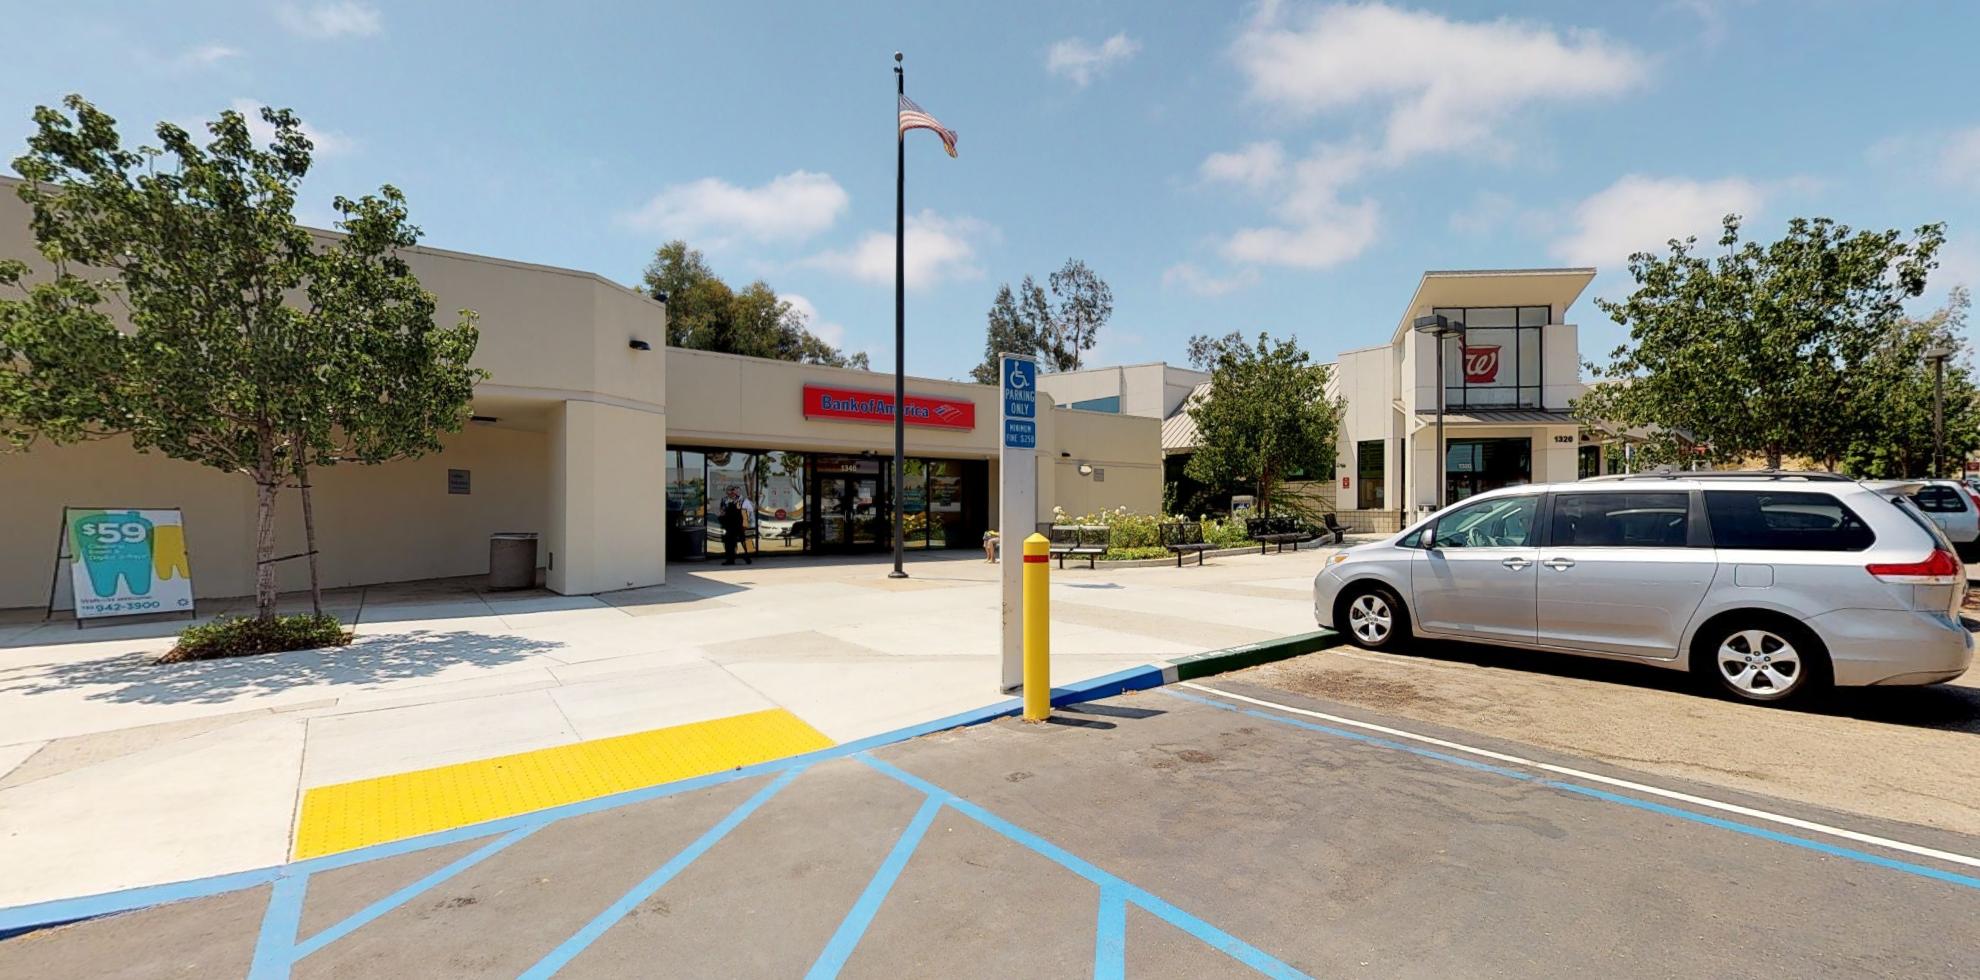 Bank of America financial center with drive-thru ATM | 1340 Encinitas Blvd, Encinitas, CA 92024